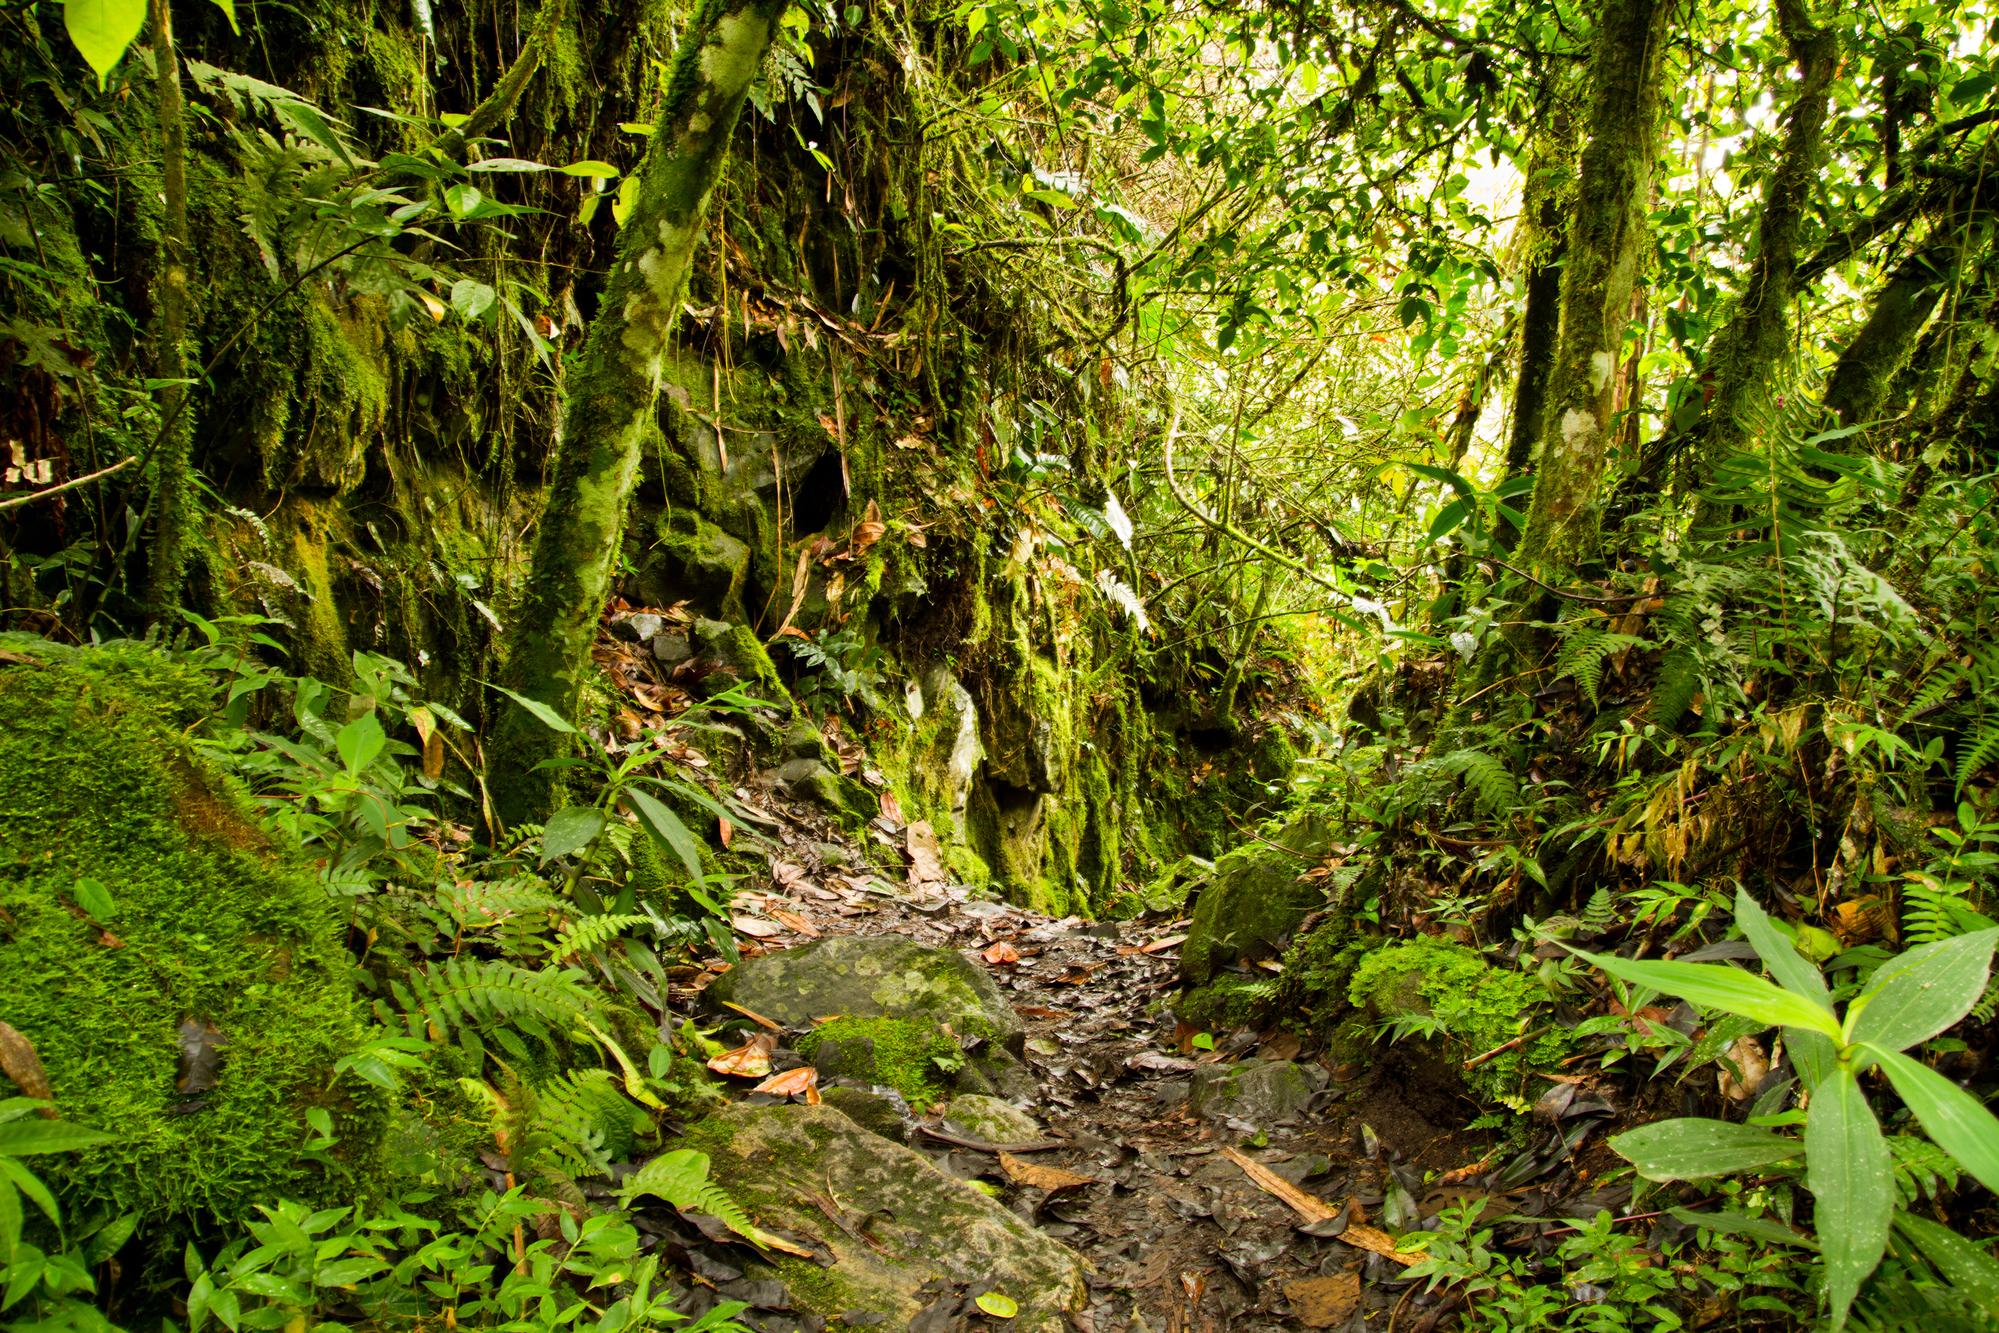 Interior of tropical rainforest in the National Park, Ecuador